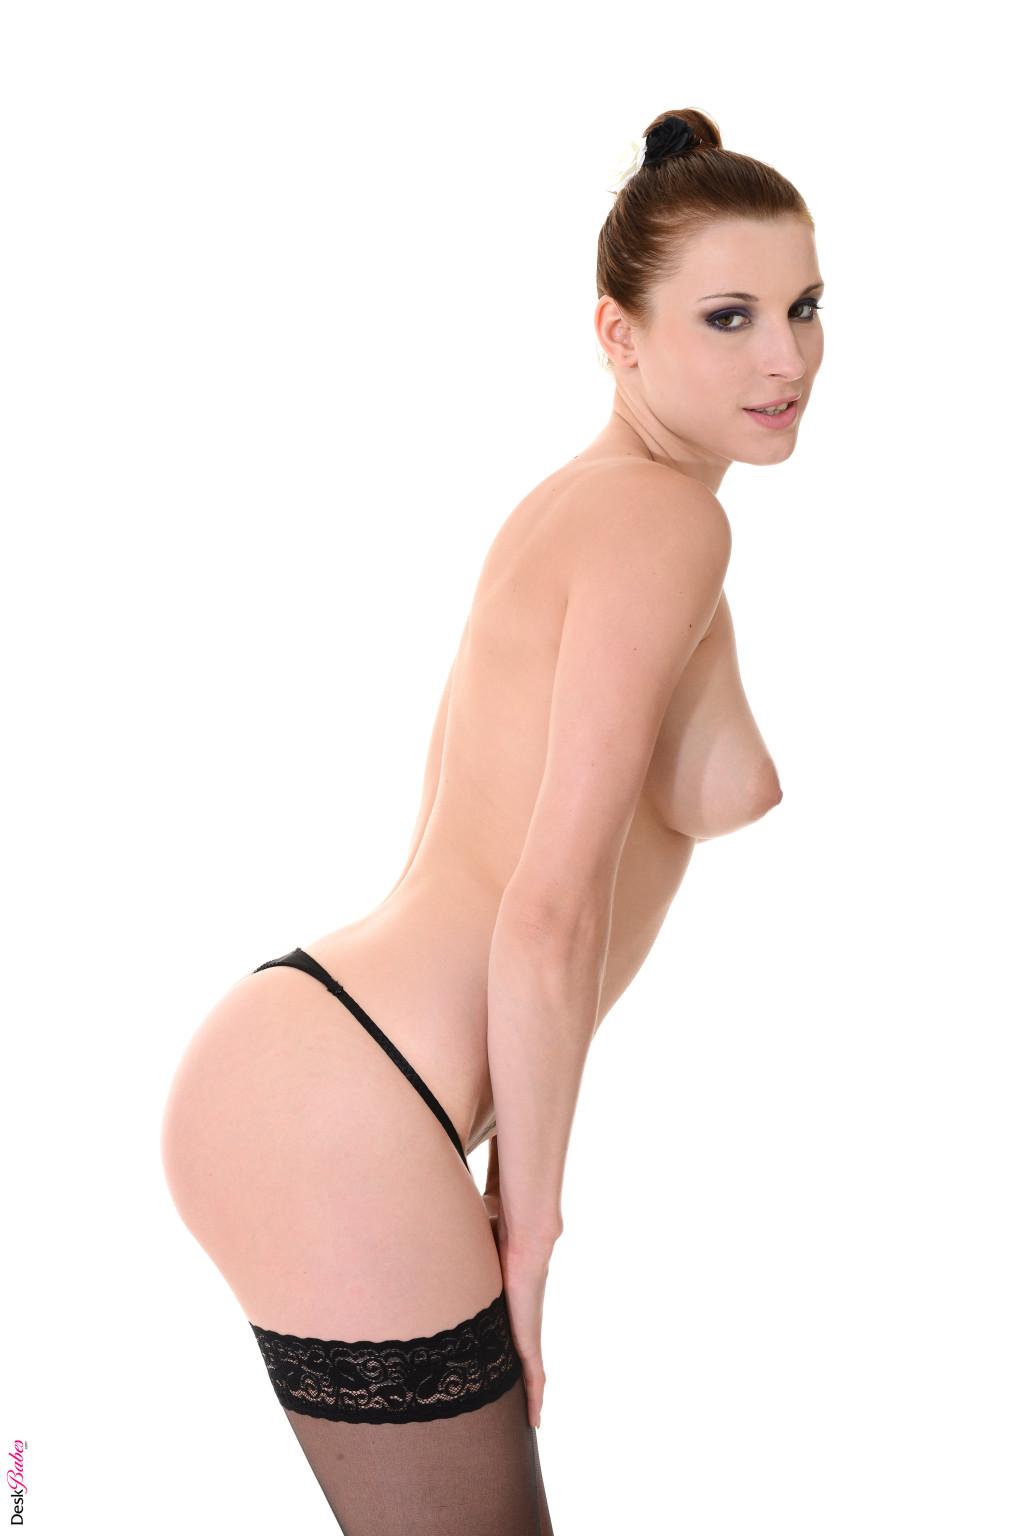 Victoria Daniels - Фигуристые женщины - Галерея № 3435983